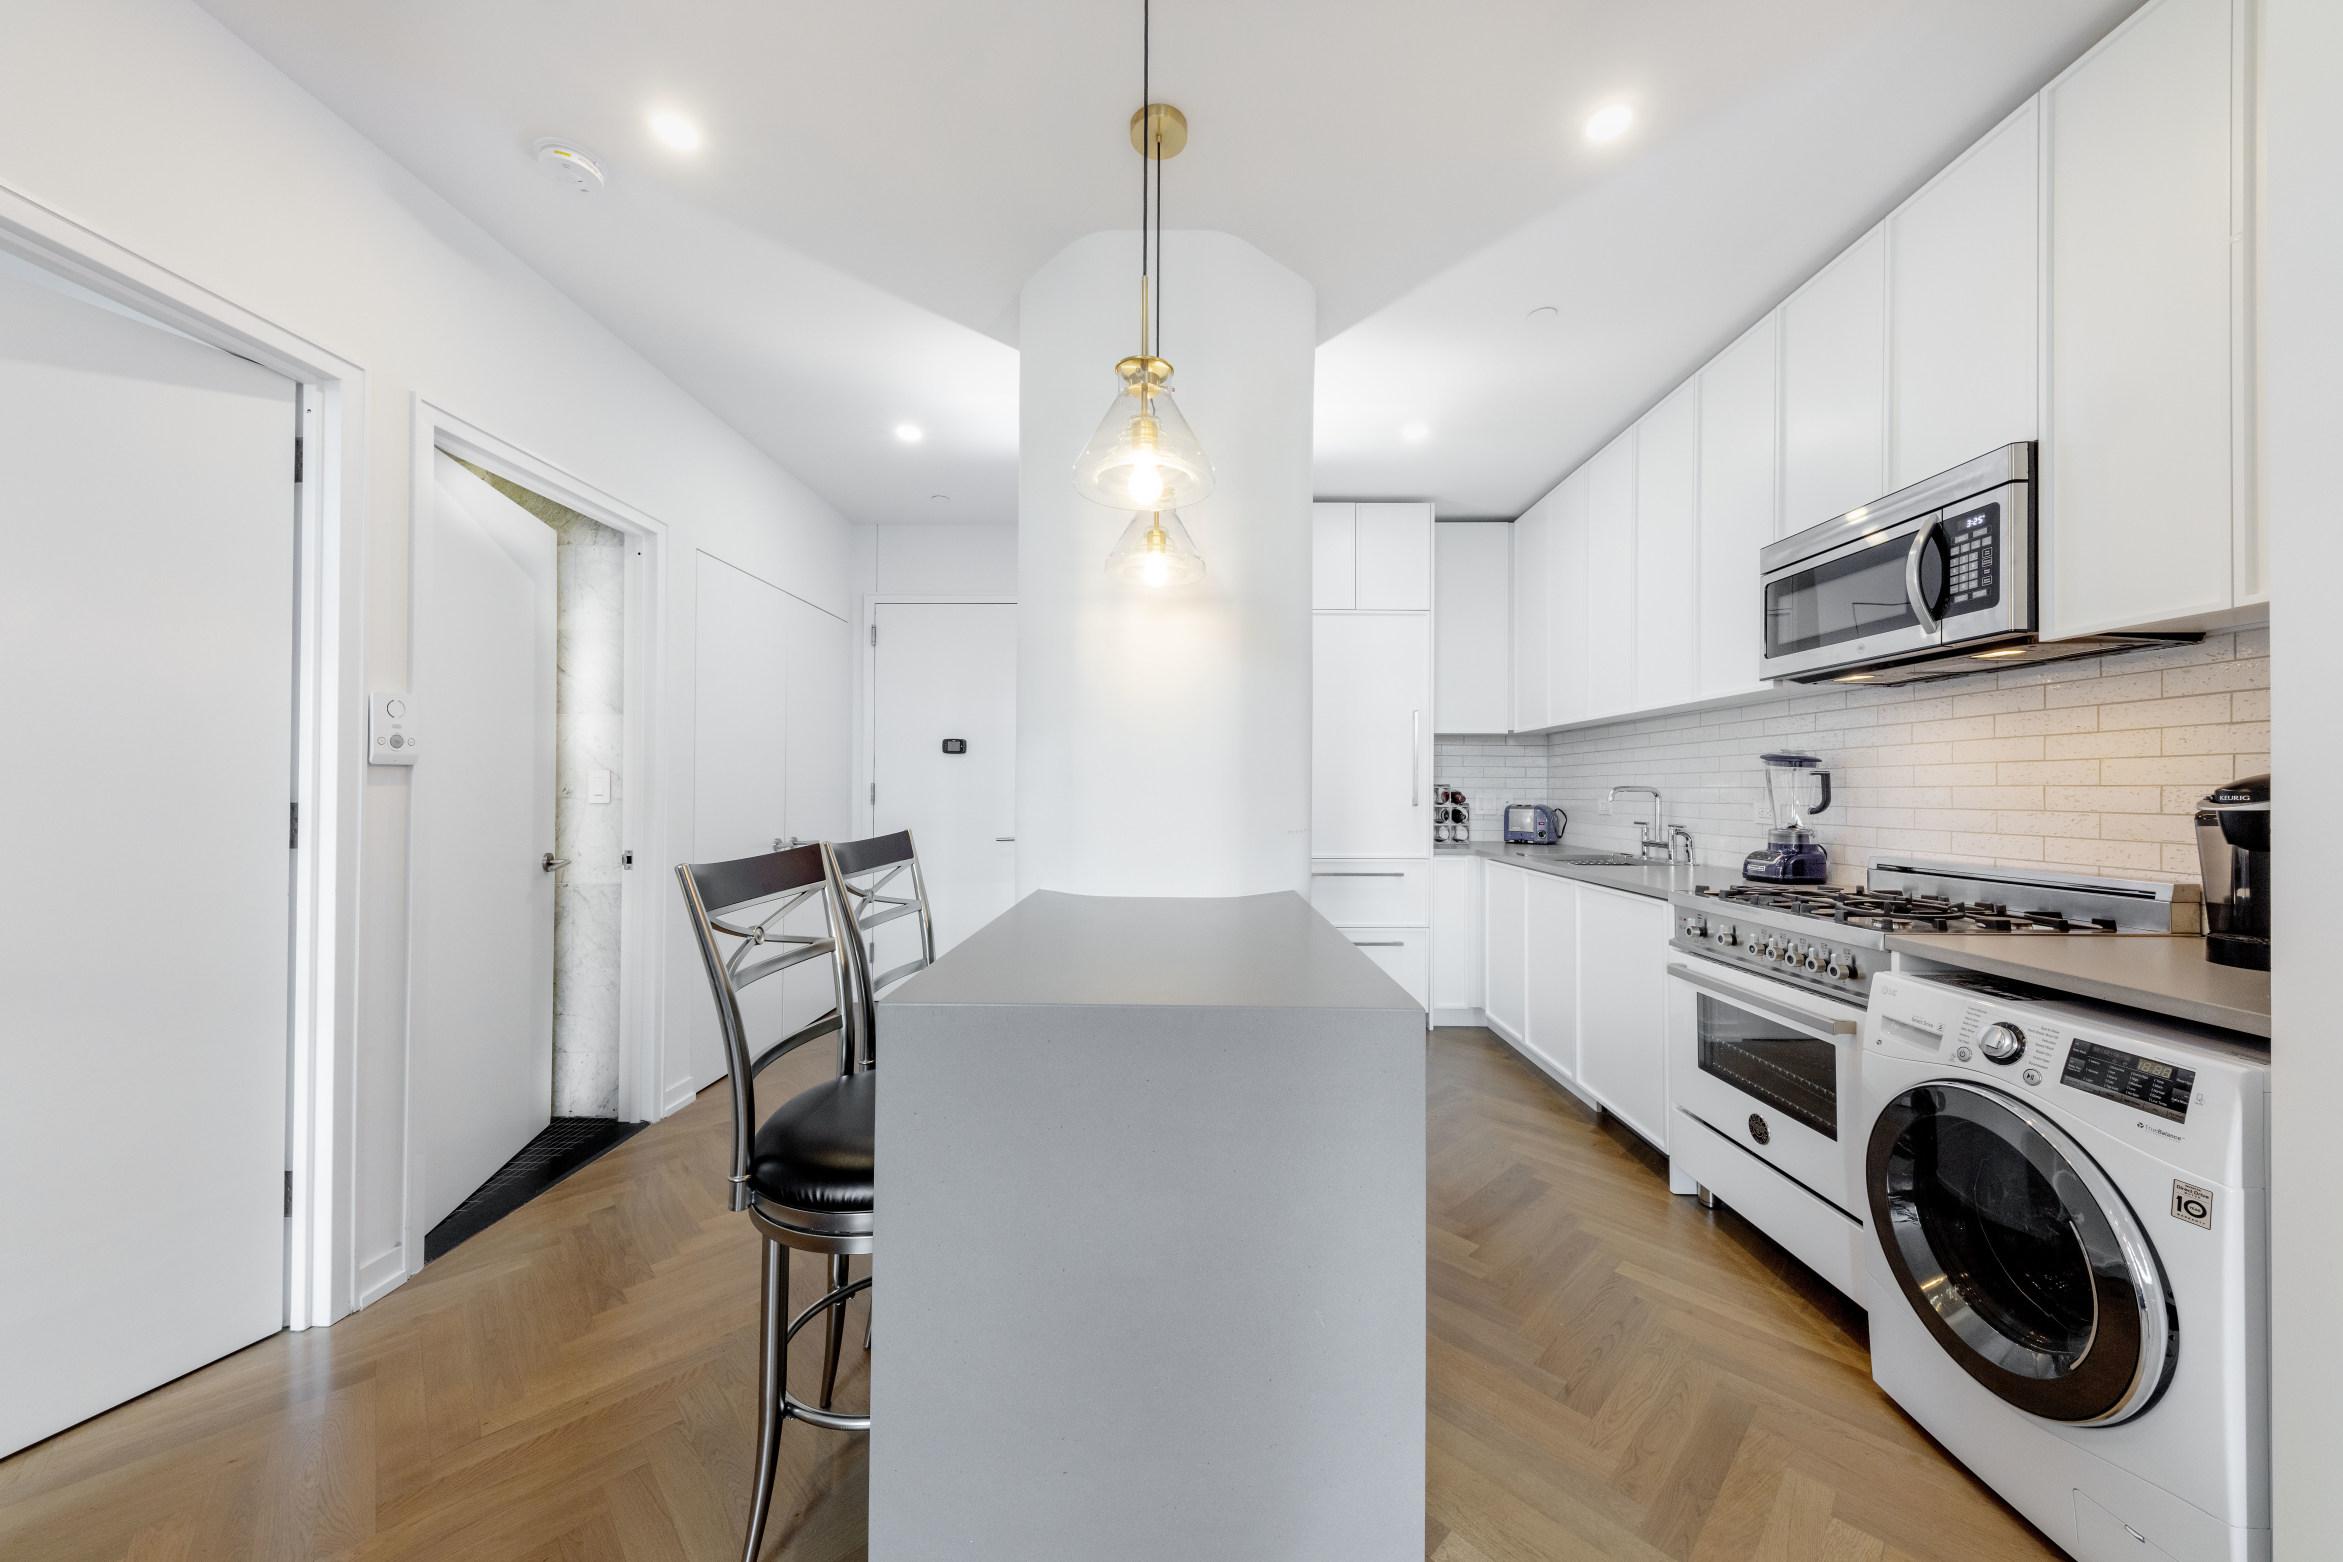 Apartment for sale at 184 Kent Avenue, Apt A-204